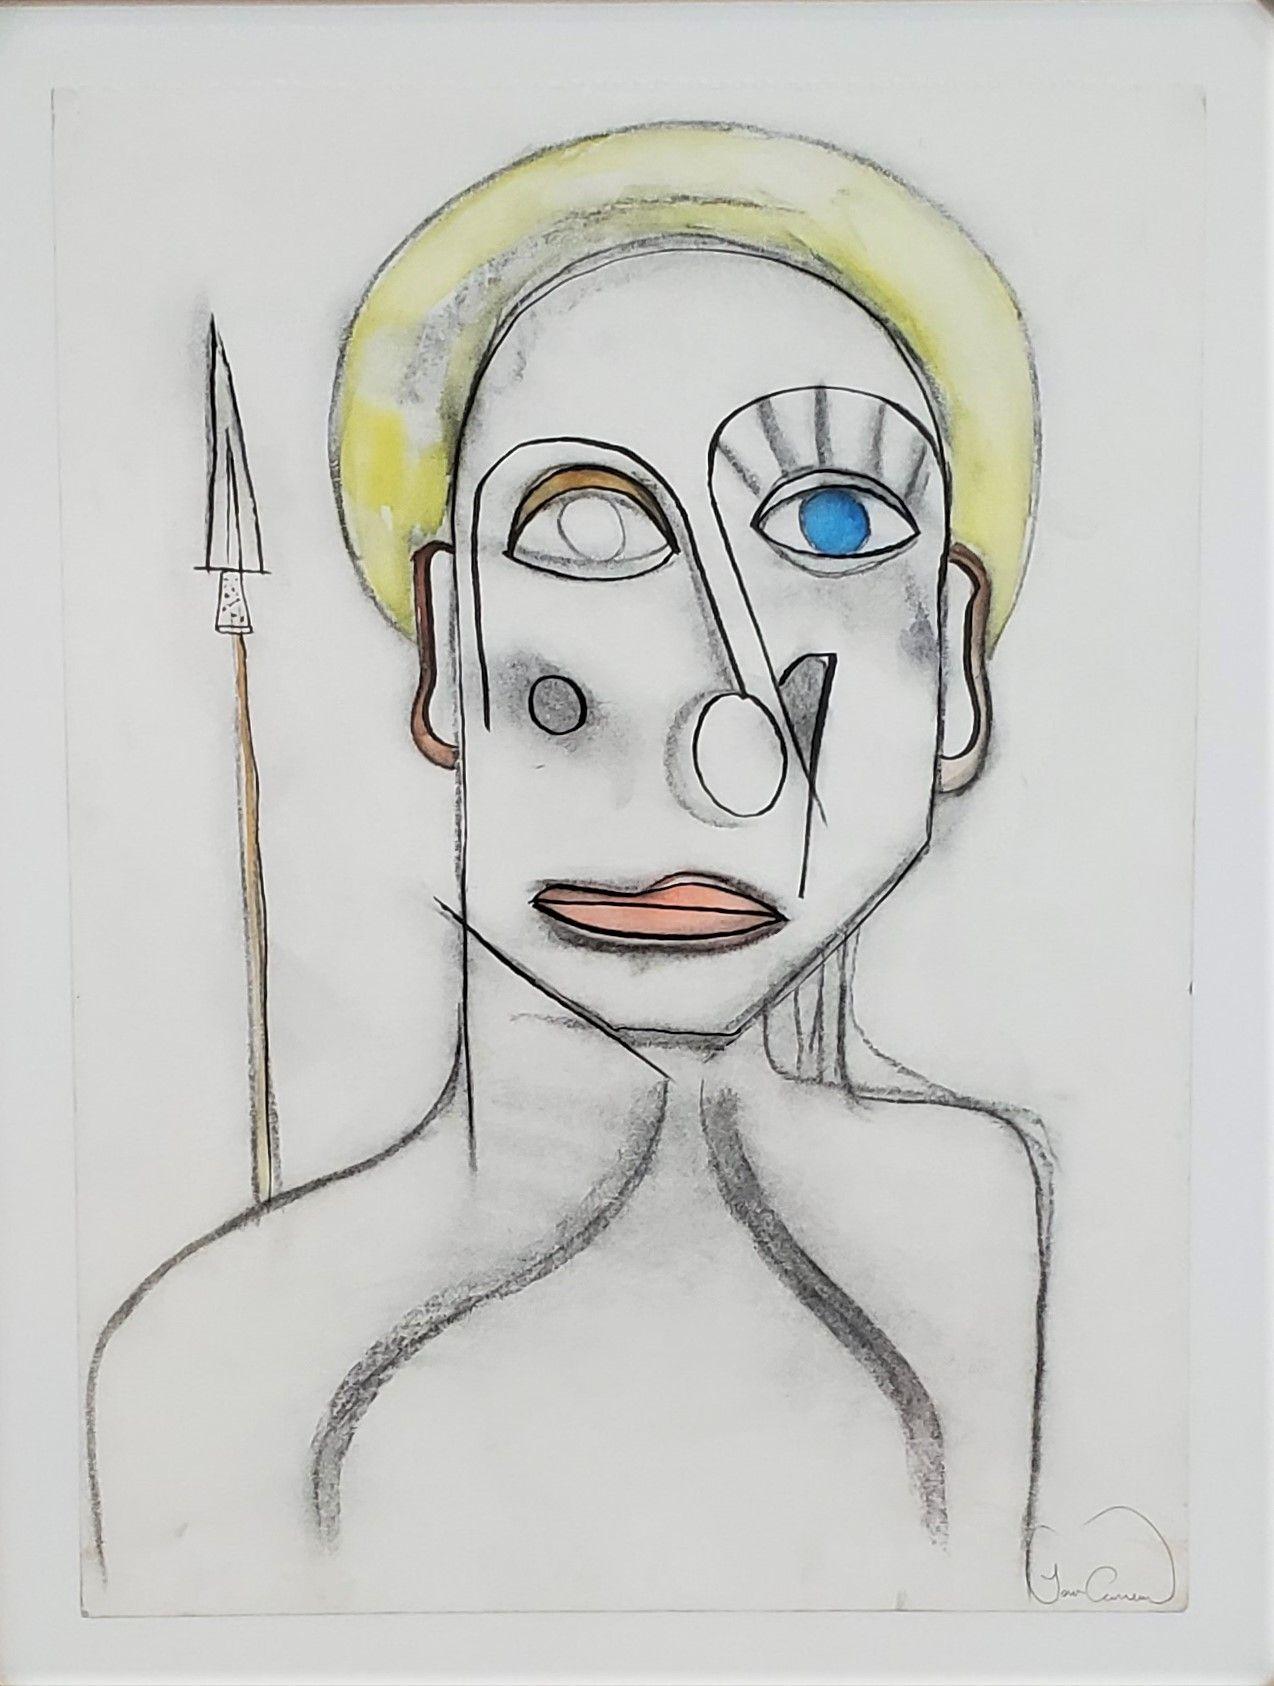 Ephraim by Louis Carreon from Redención at Hg Contemporary Madrid